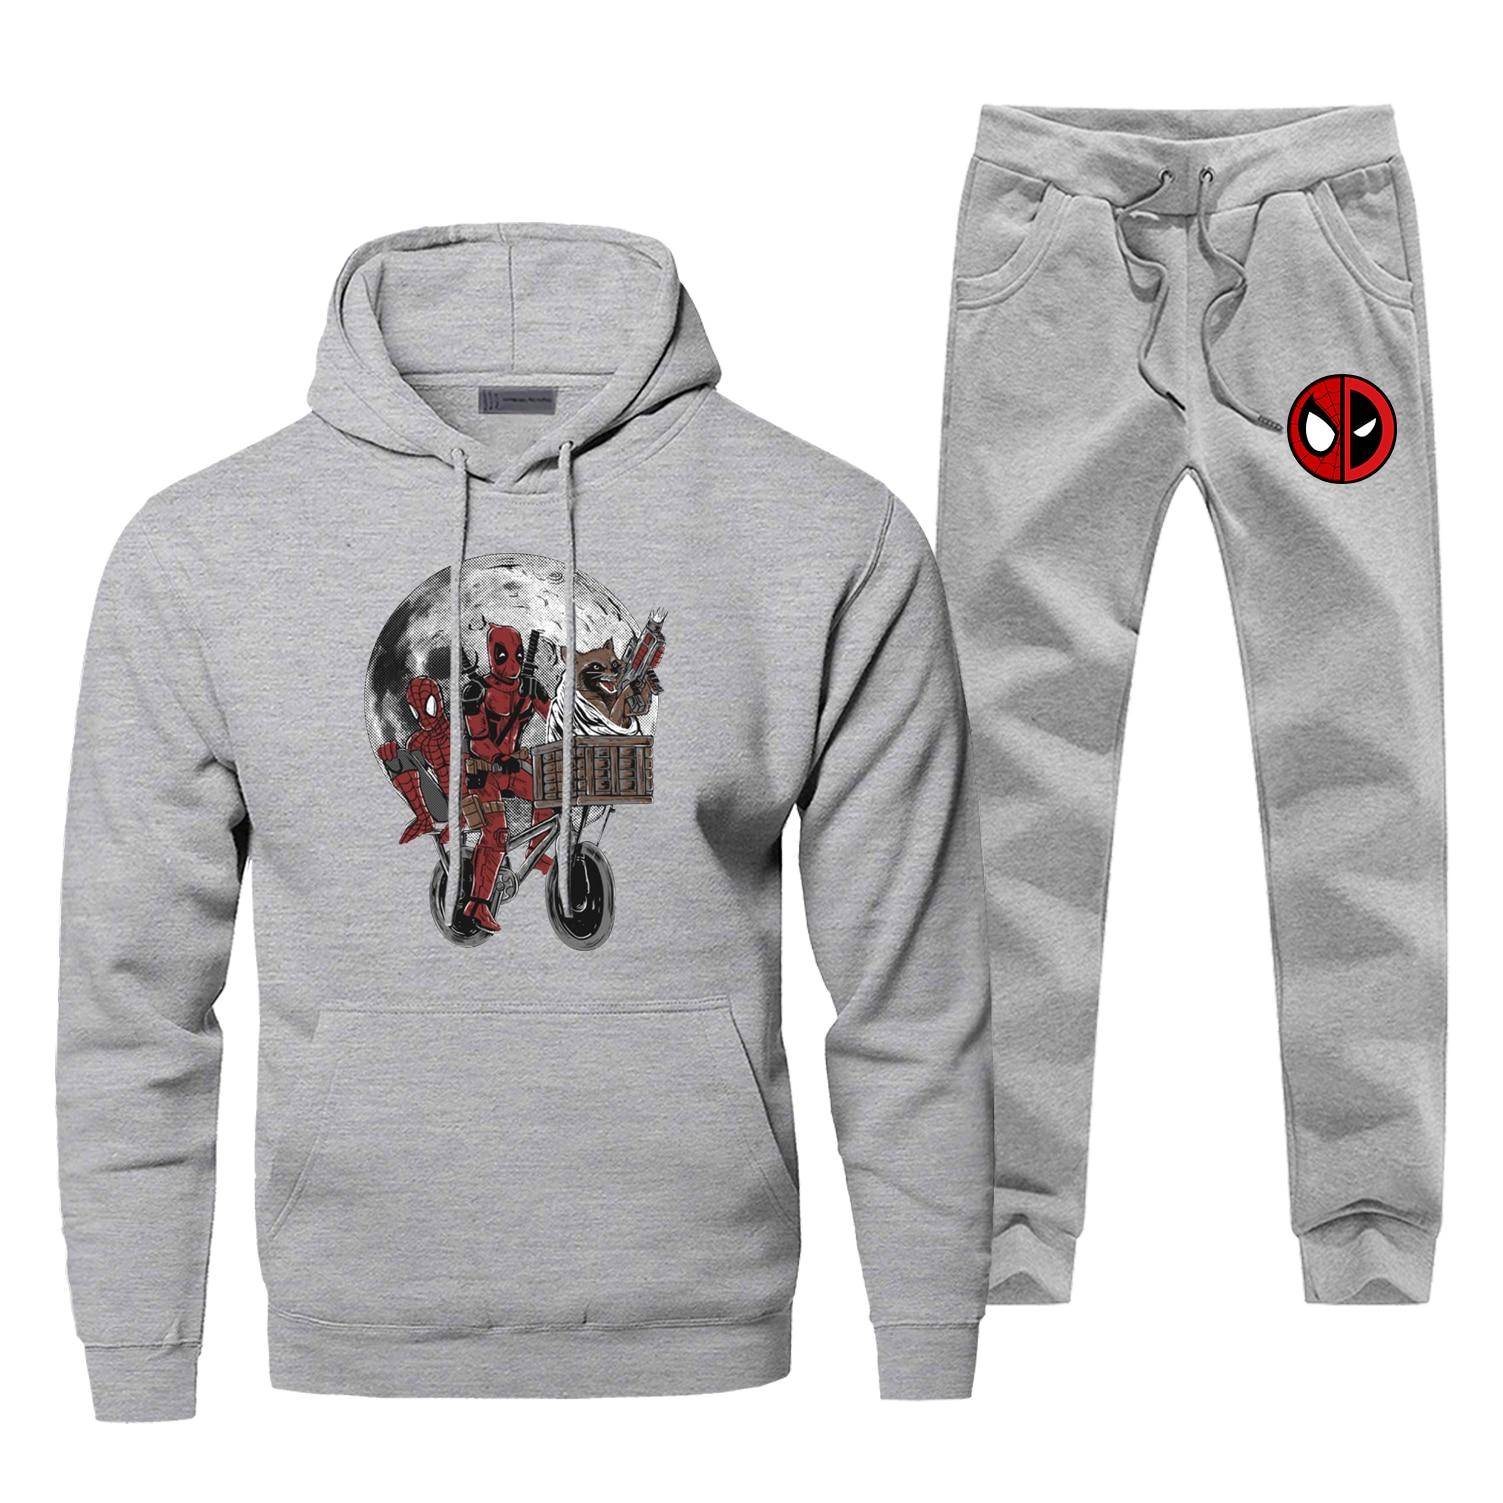 Deadpool Funny Sportsman Wear Fashion Super Hero Spider-Man Men's Sets Casual Fitness Pants Sweatshirts Hip Hop Mens Sports Suit